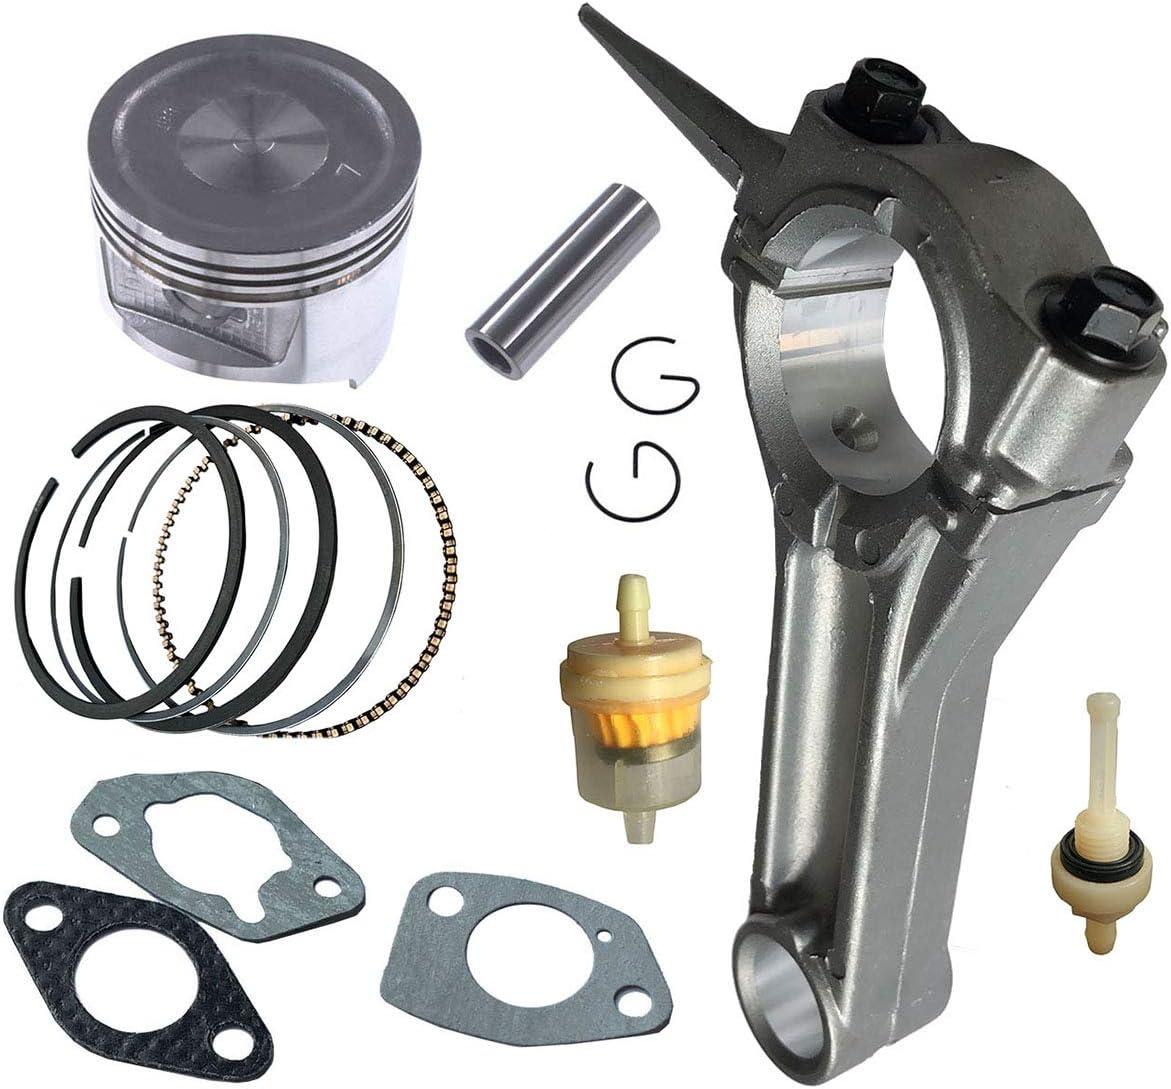 FJSa Connecting Rod Piston Ring Gasket Kit for Honda GX390 188F 13HP Replace 13101-ZF6-W00 Generator